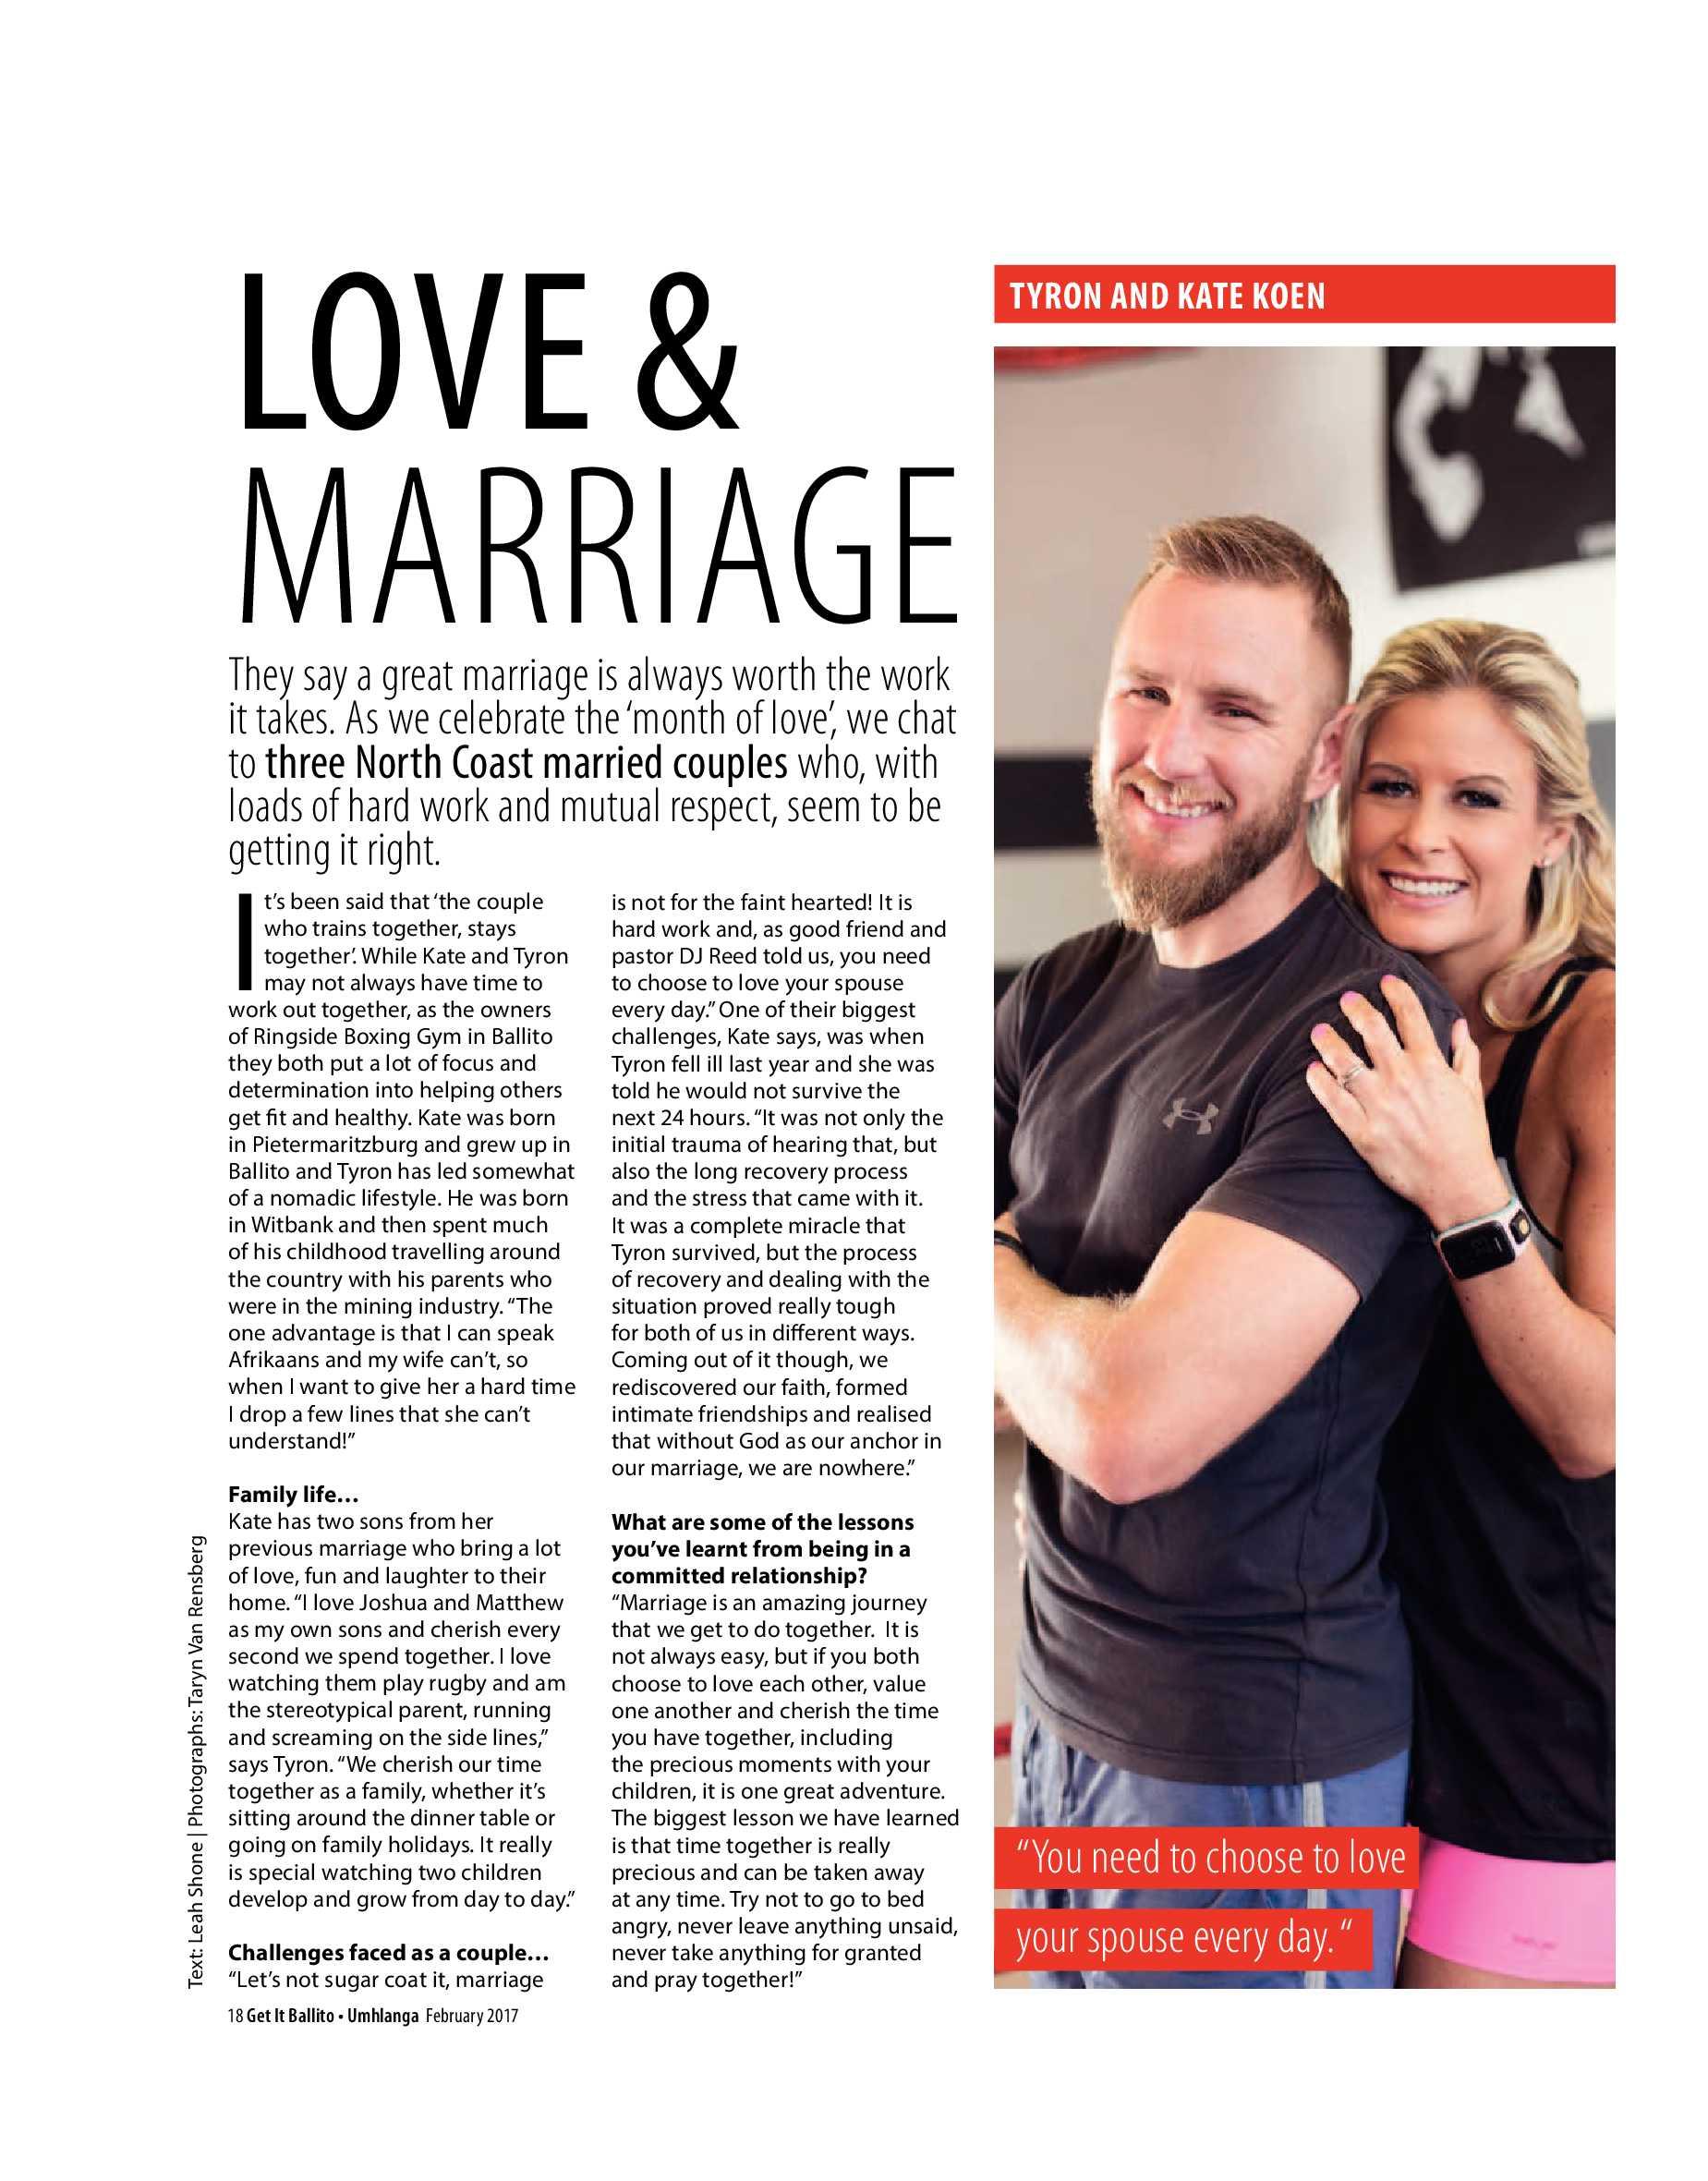 get-it-magazine-ballitoumhlanga-february-2017-epapers-page-20